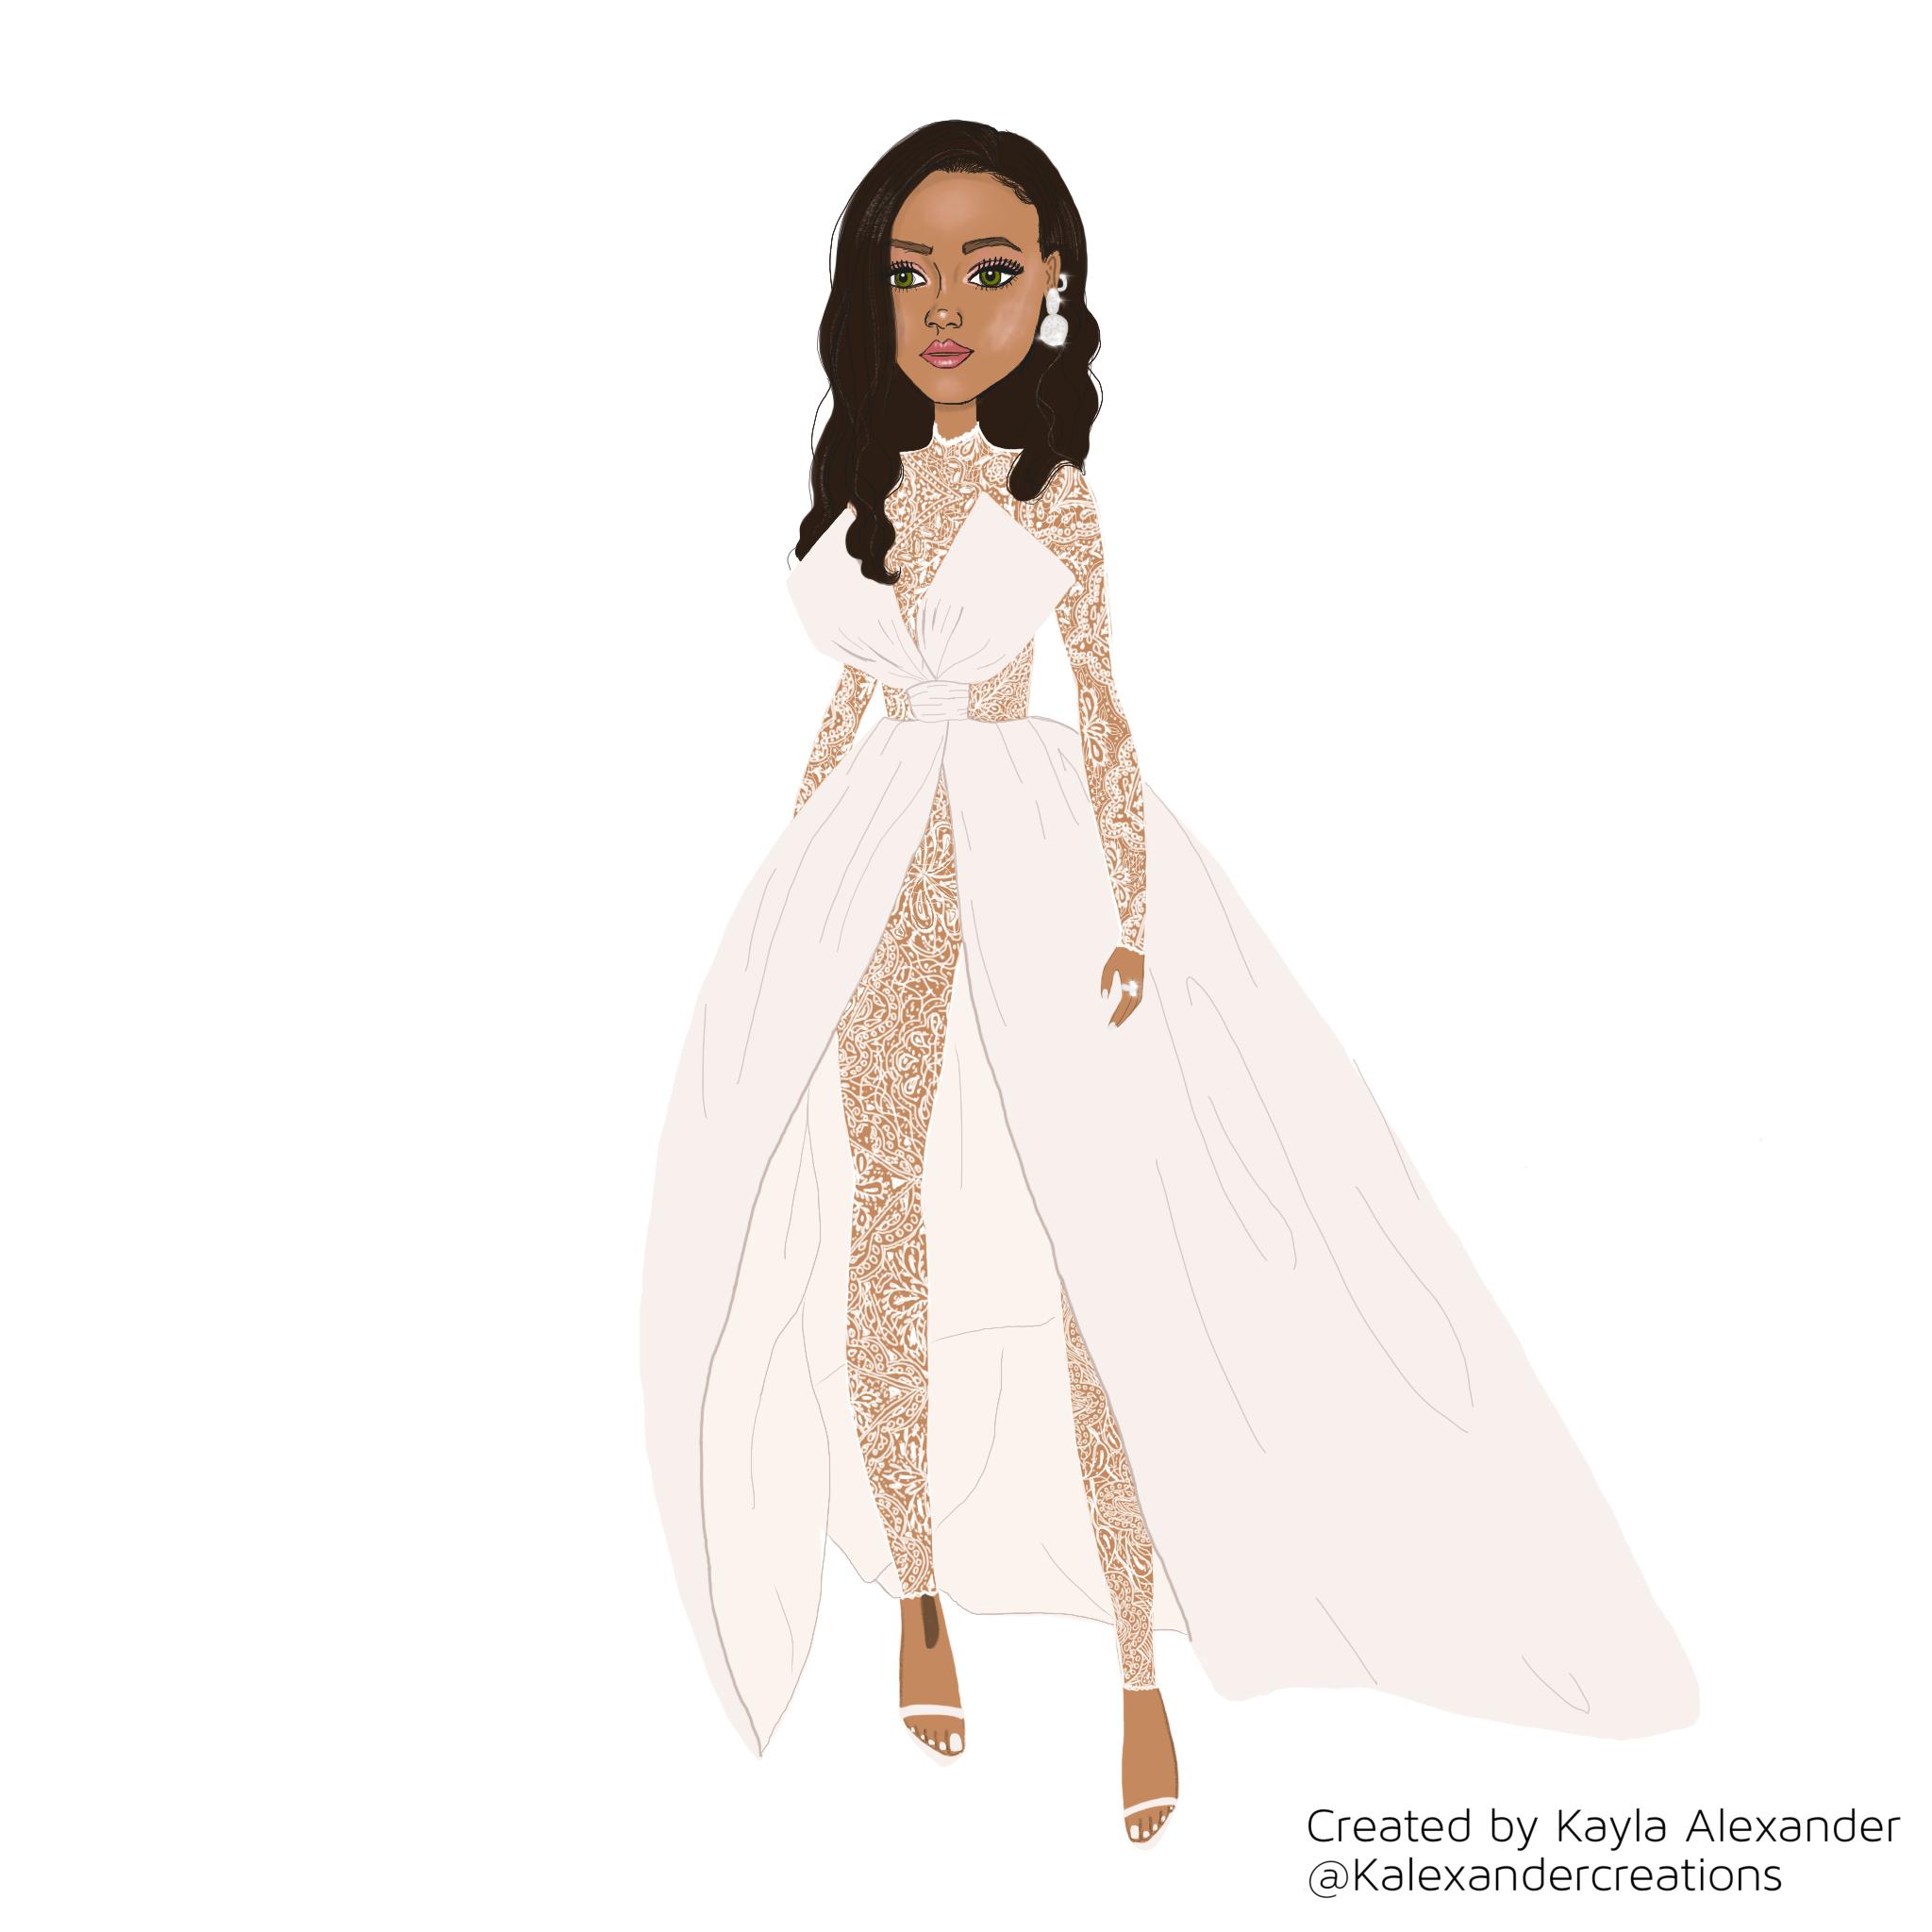 Illustration of Rihanna at her annual Diamond Ball created with Procreate app on iPad Pro.